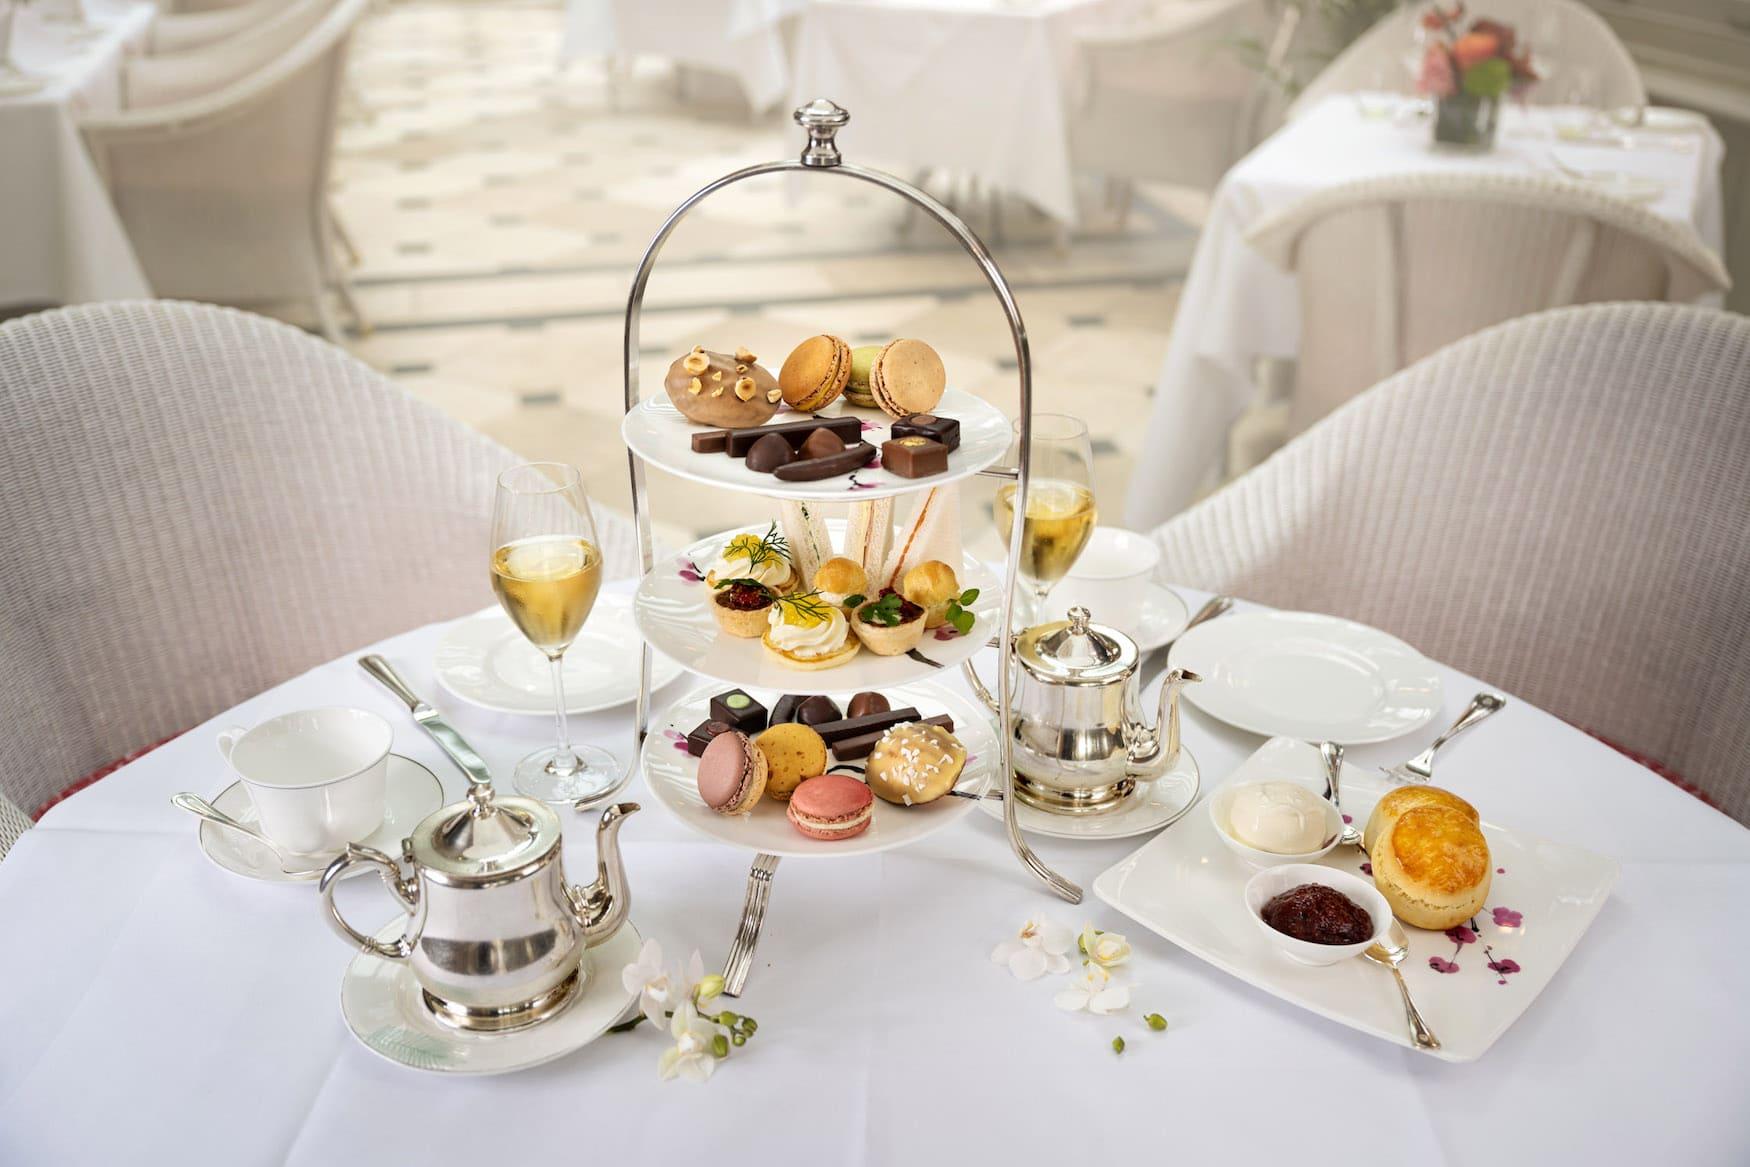 Afternoon Tea inspired by Pierre Hermé Paris